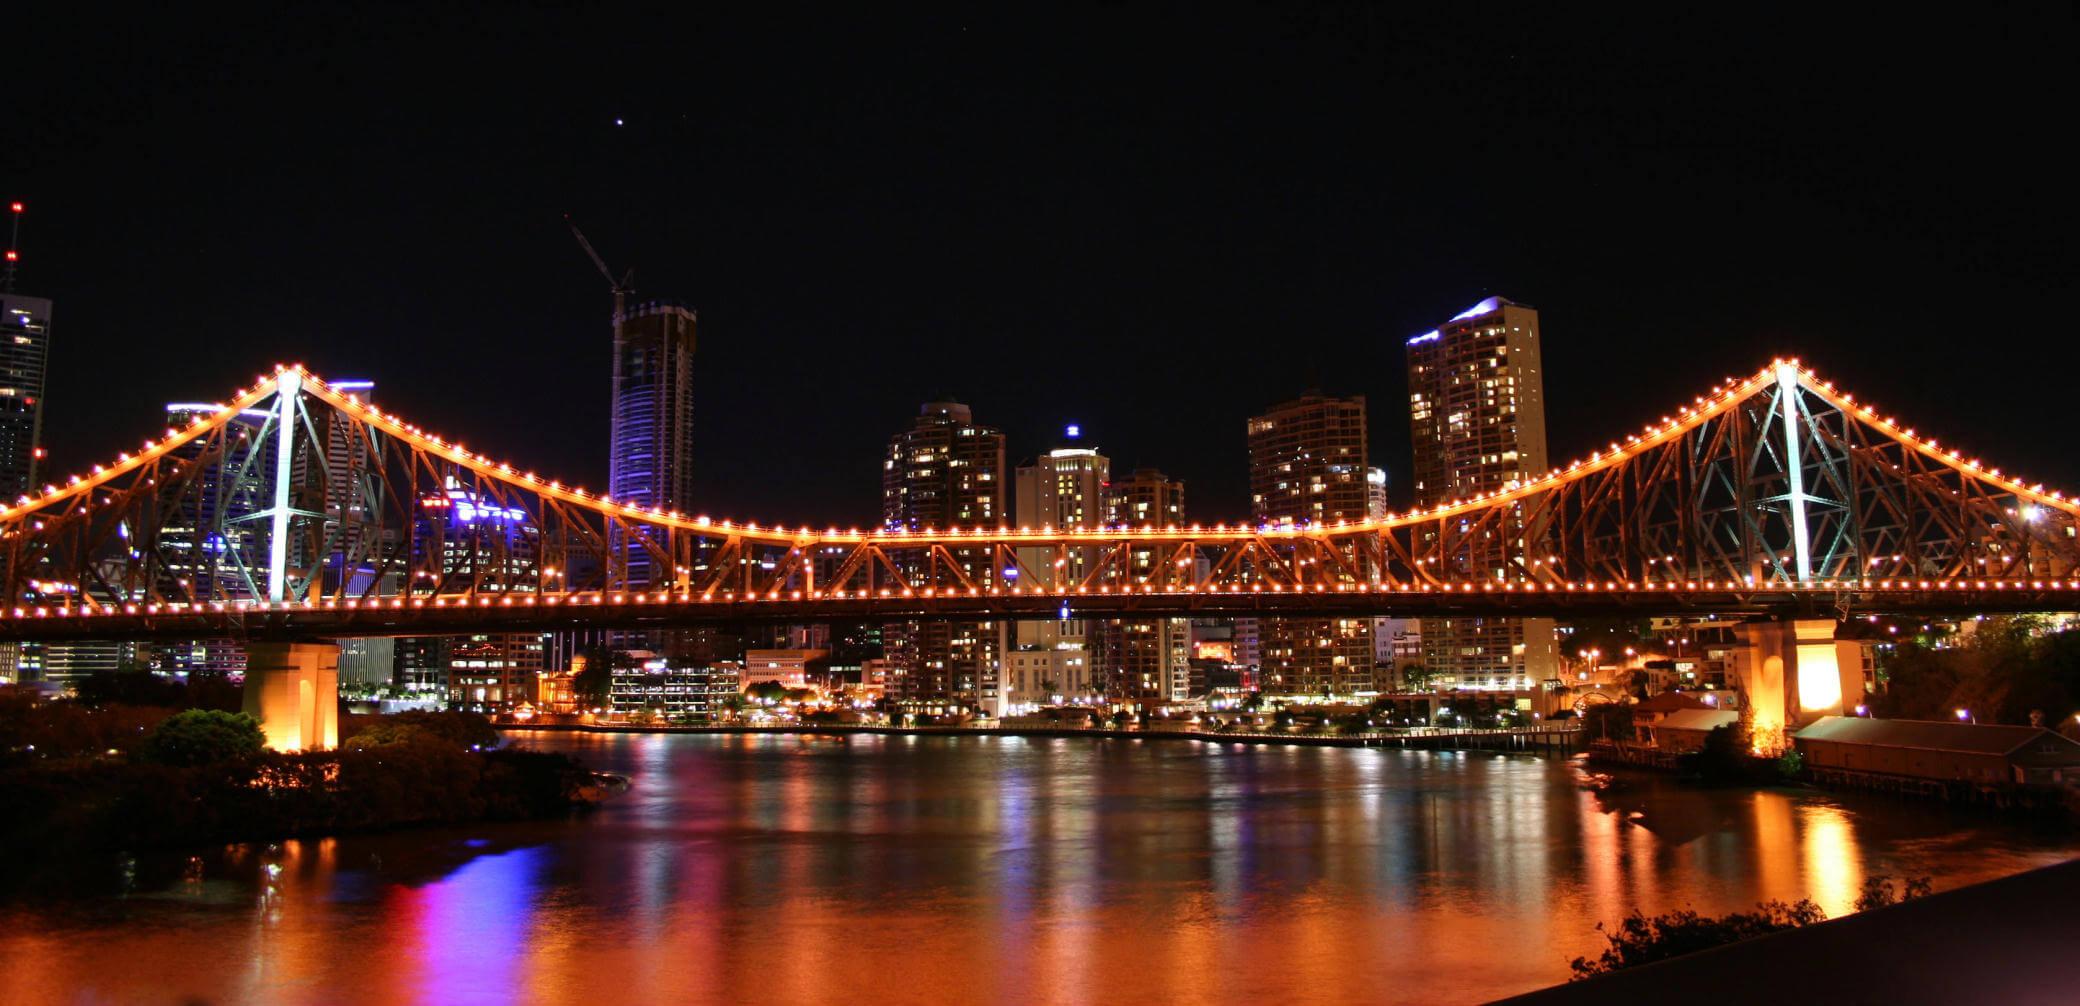 De beste stedentrips vindt u op BoekLastminute.com